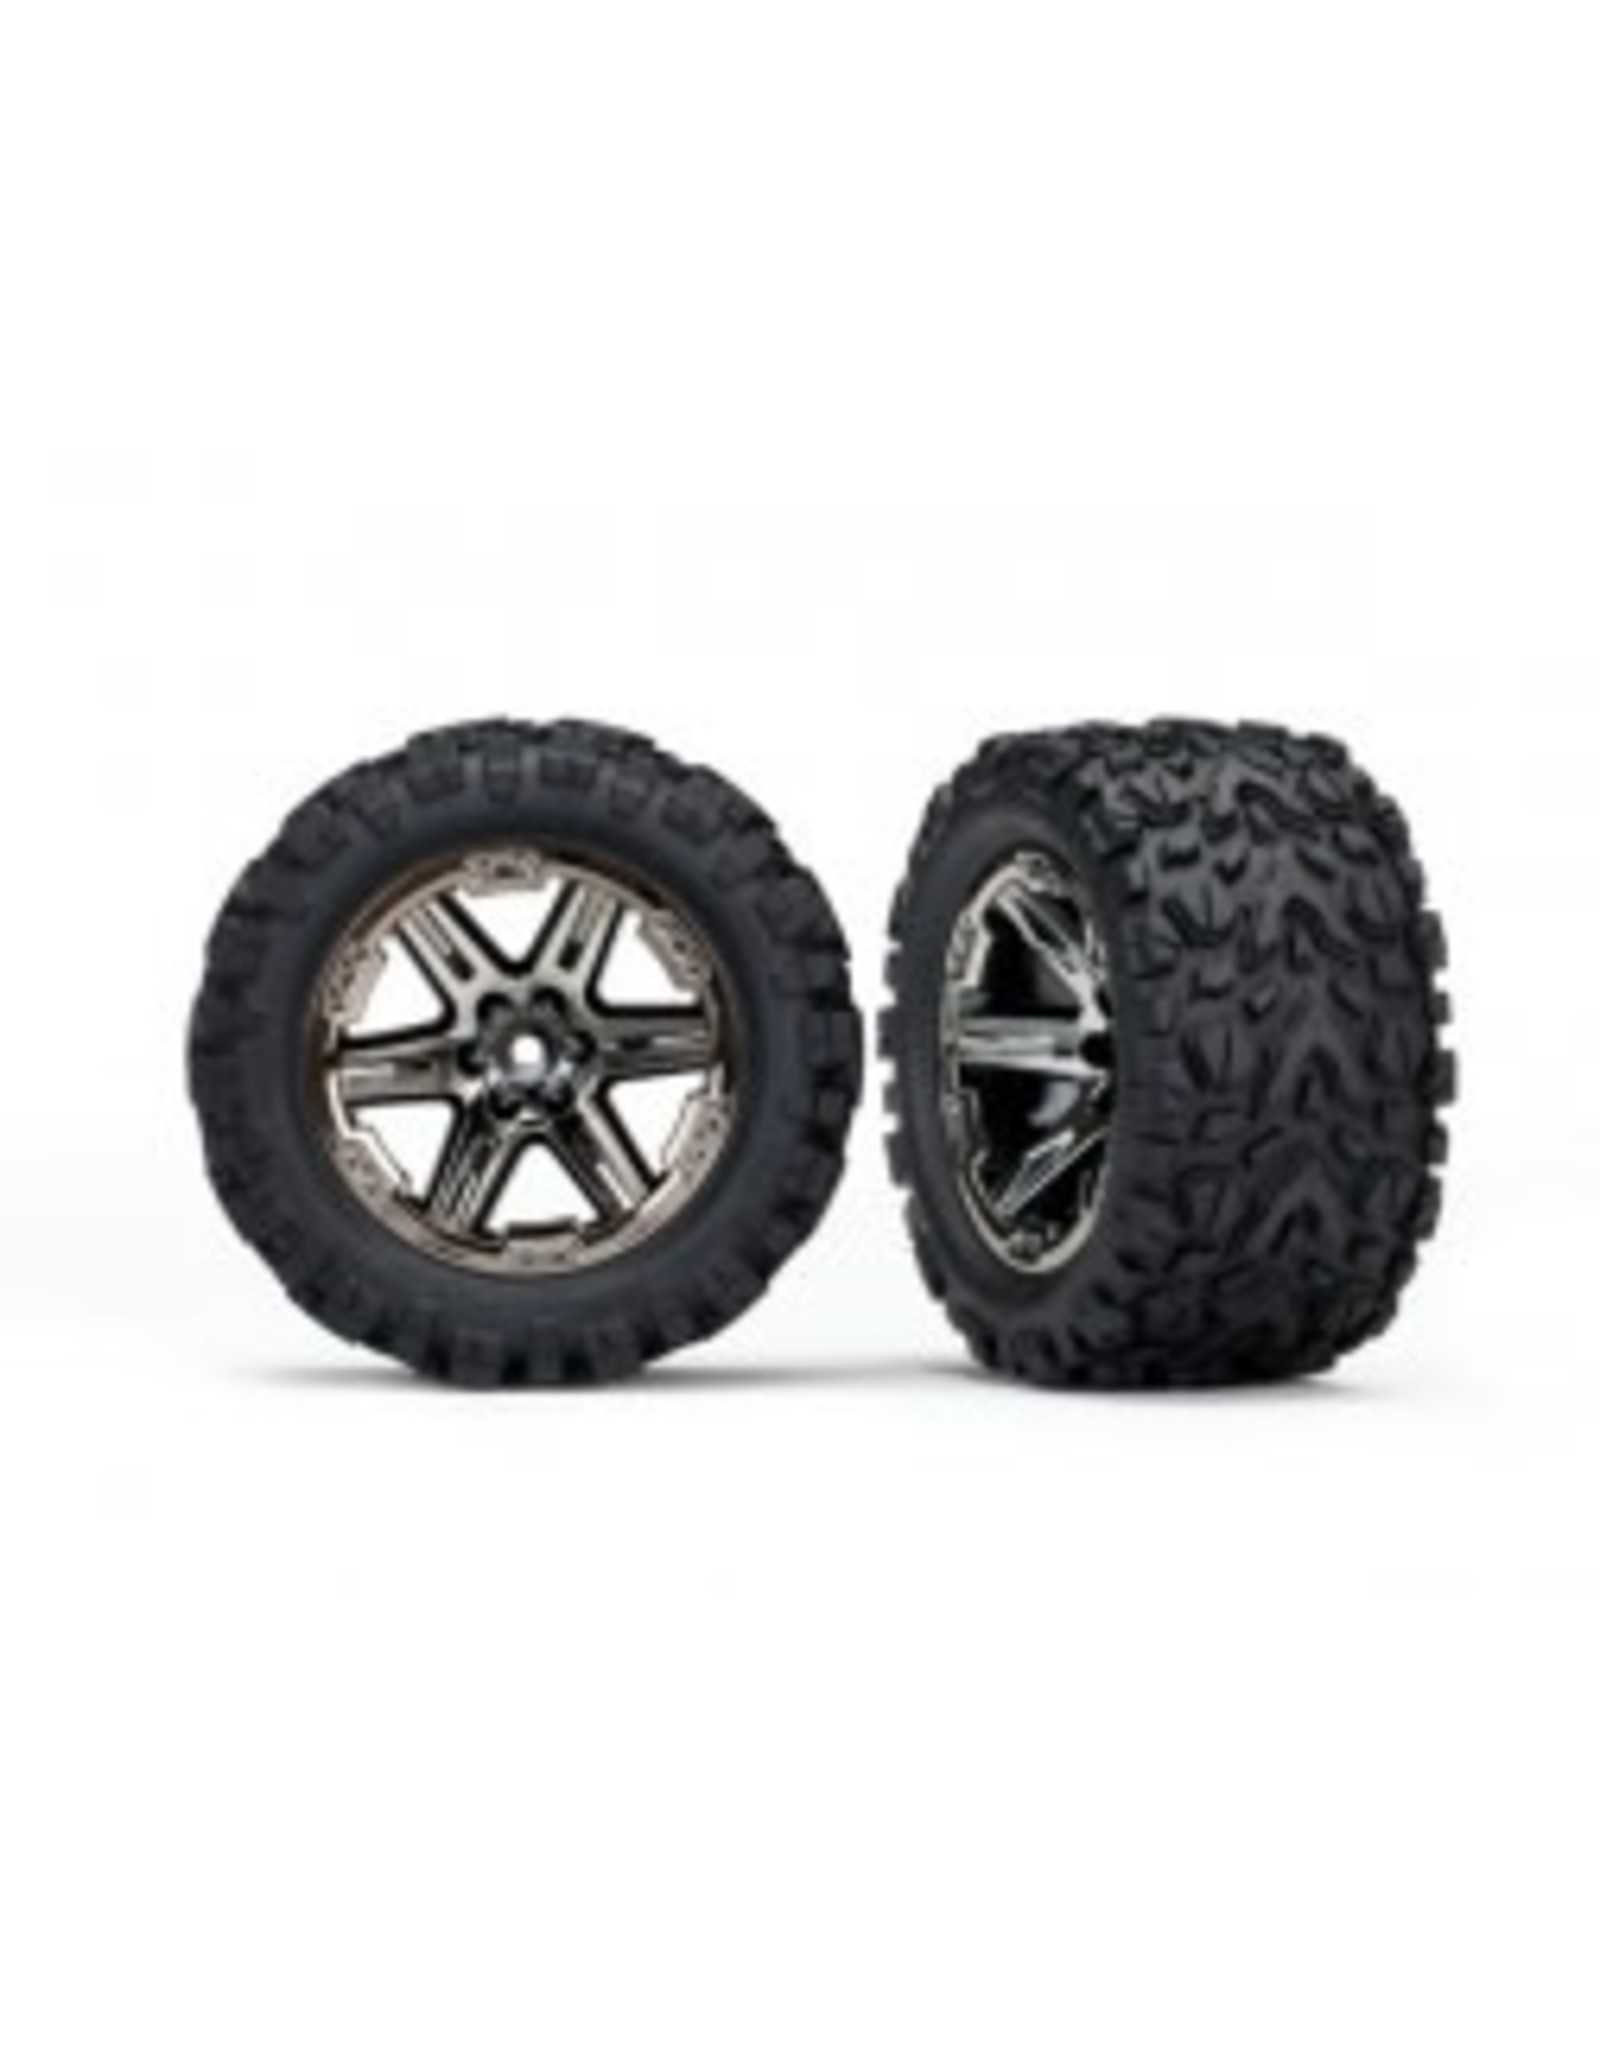 Traxxas Traxxas T & W RXT CHRM/Talon Ext Tire  Rustler